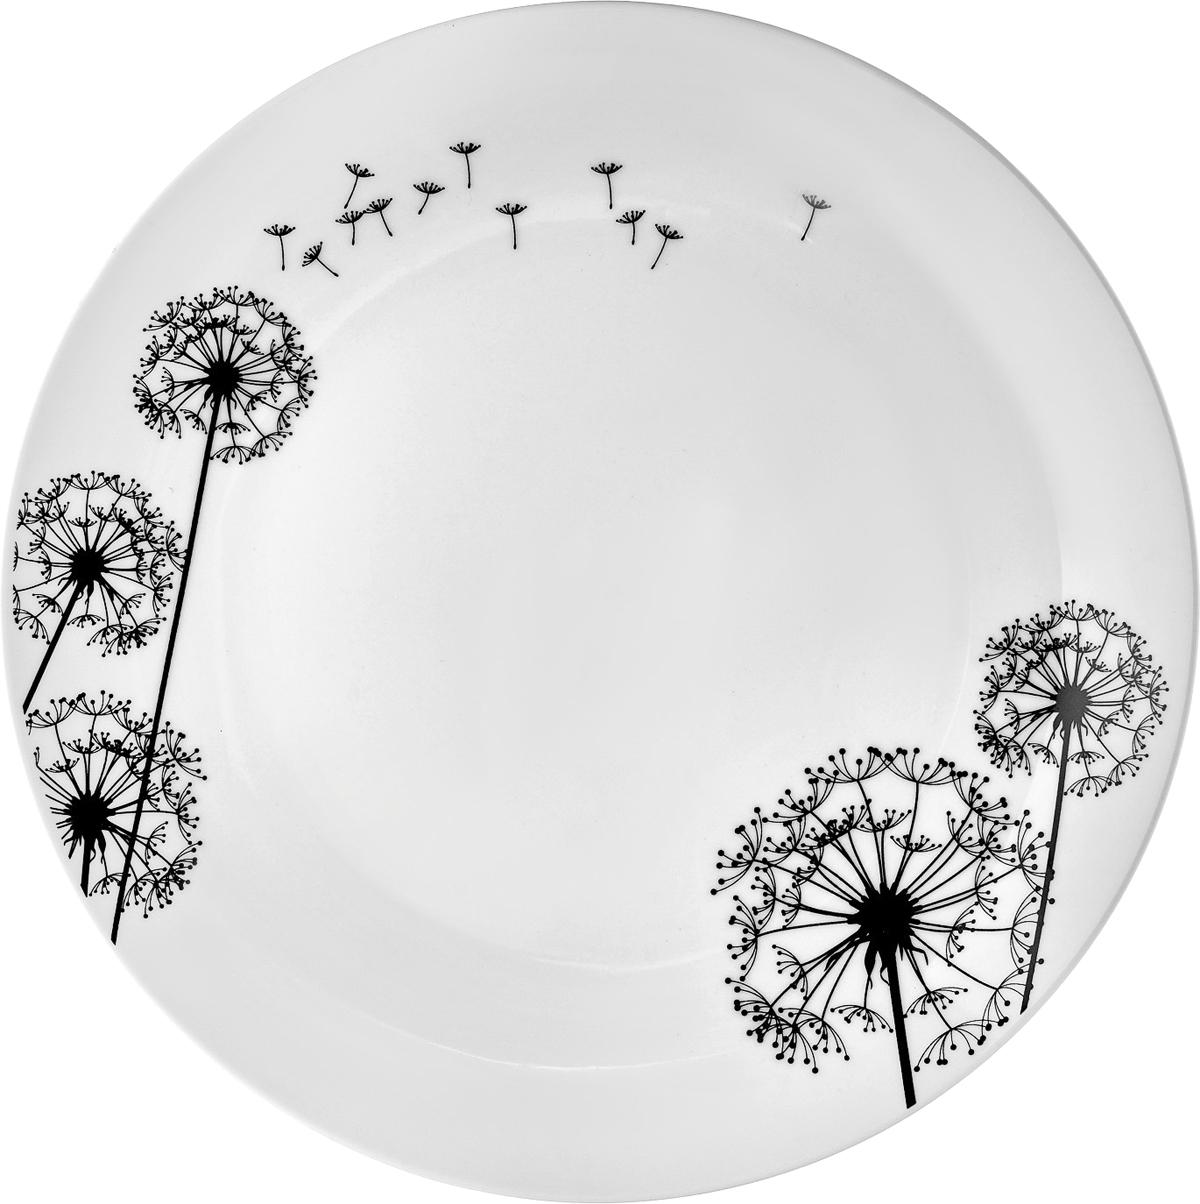 Набор обеденных тарелок Esprado Viente, диаметр 24,5 см, 6 шт посуда из фарфора оптом